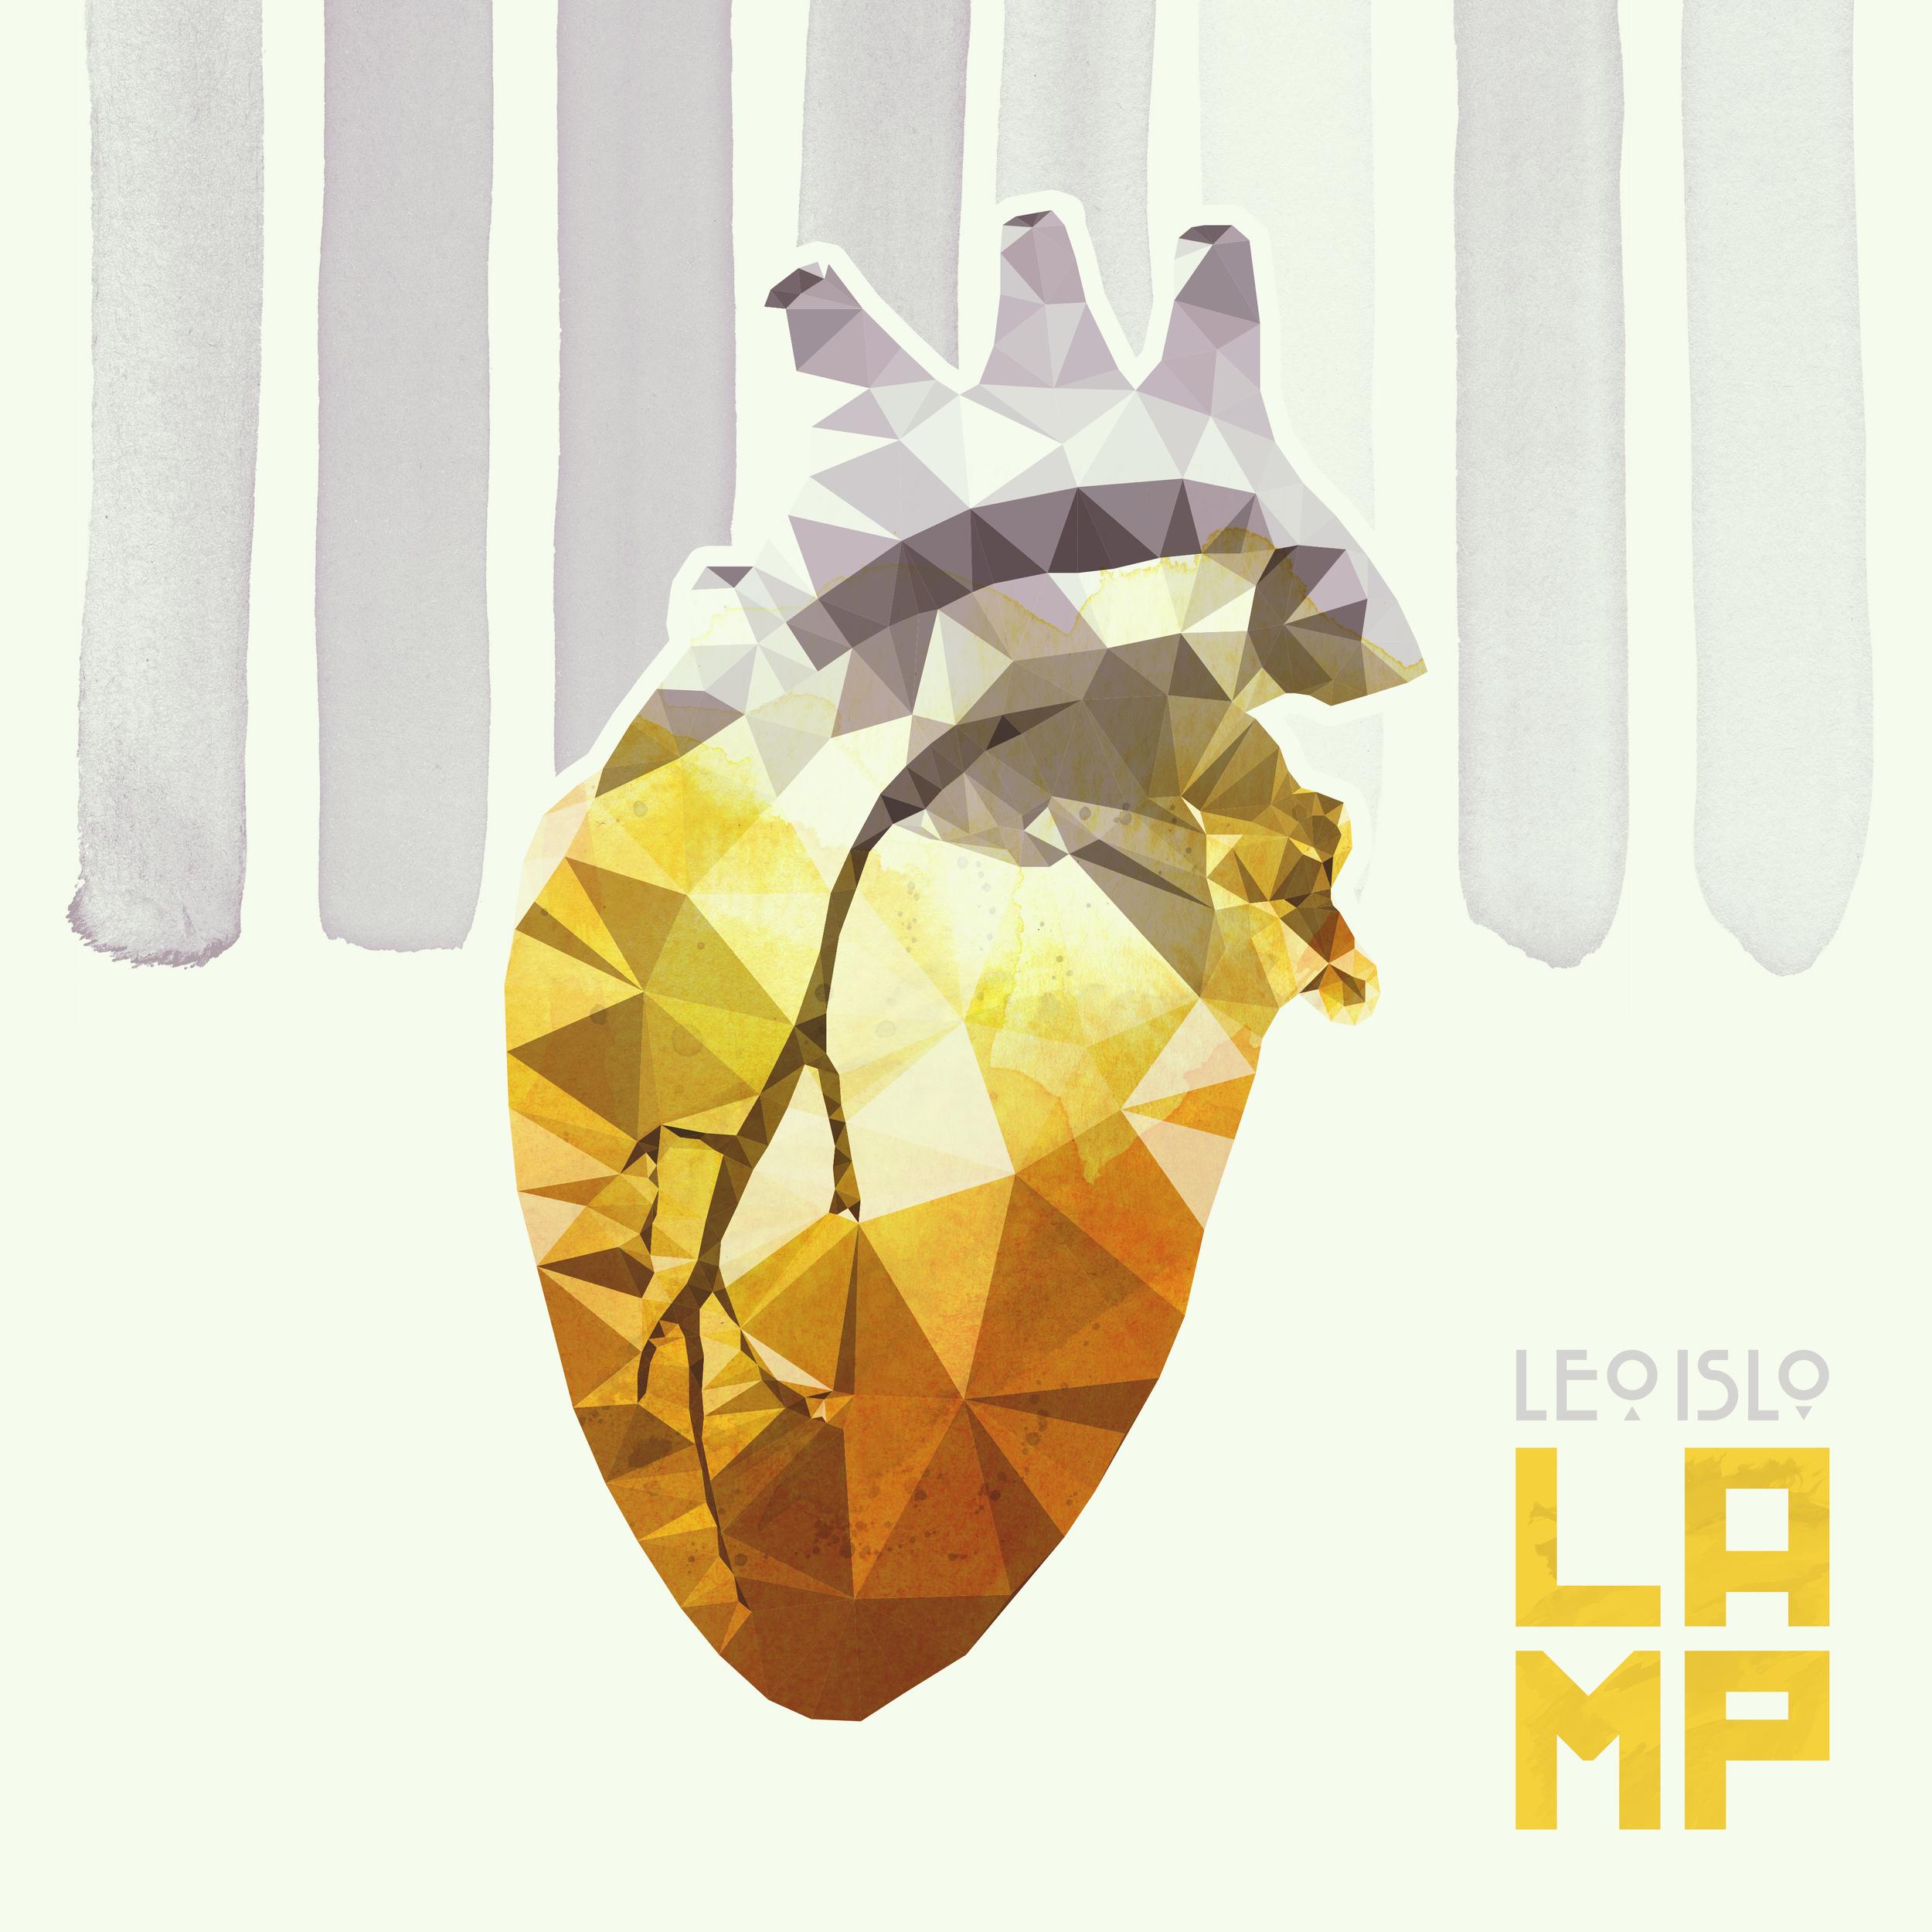 LEO ISLO | Feelings